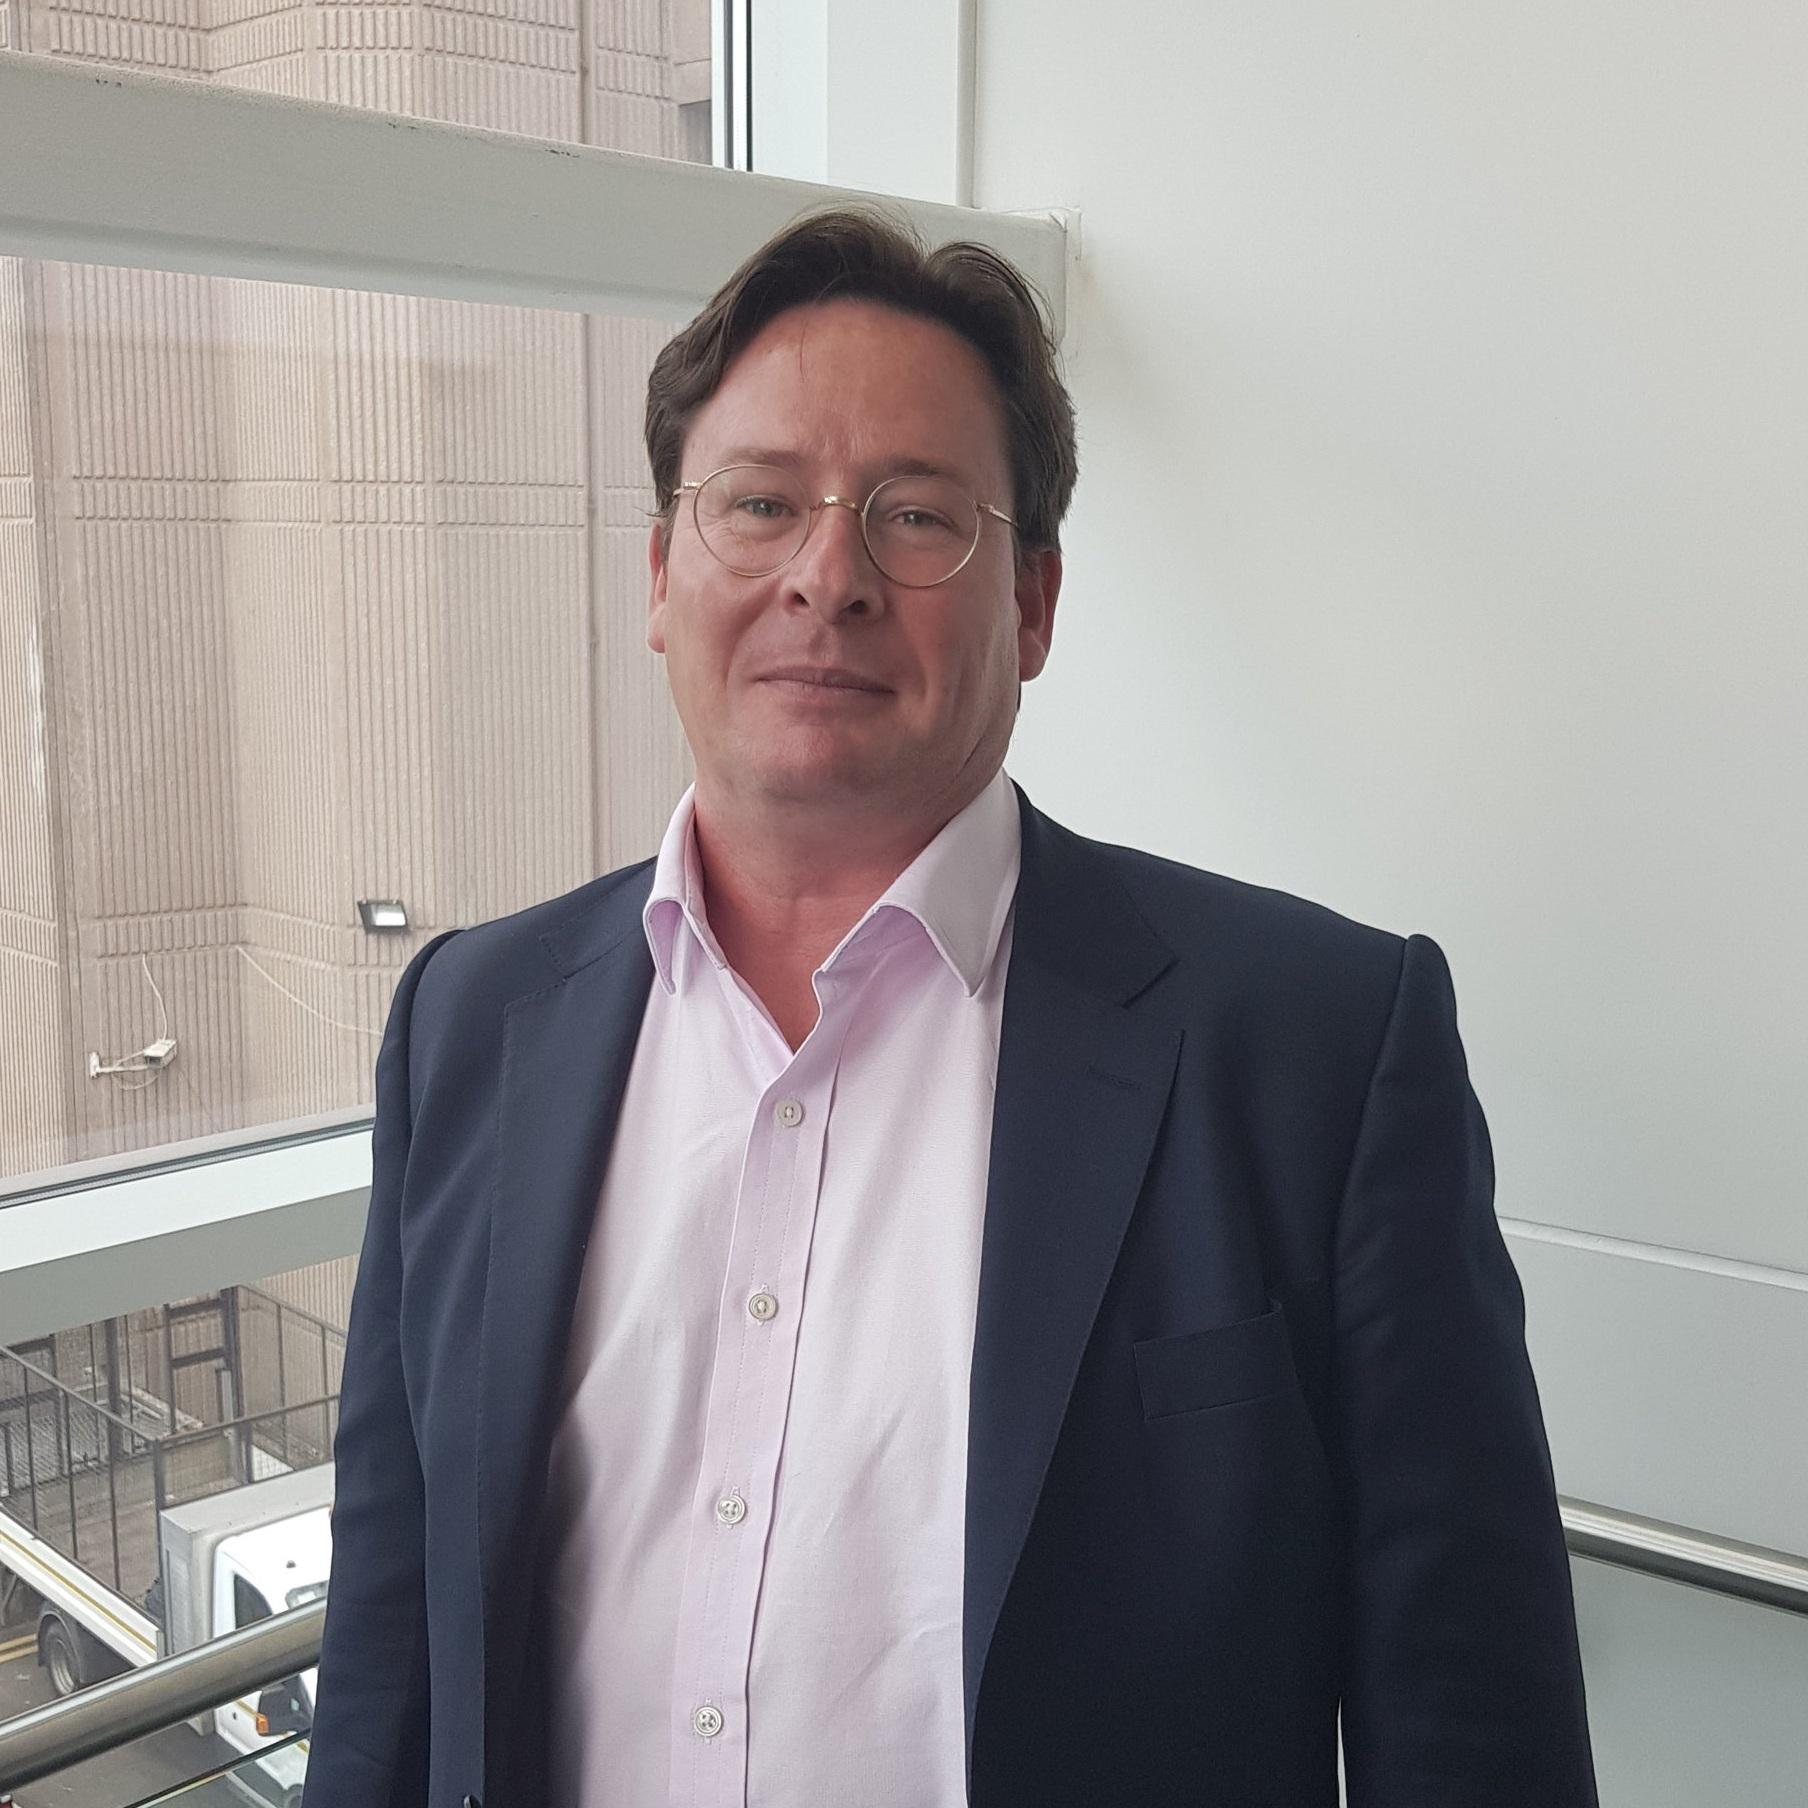 Jonathan Yates - Chief Executive, Citizens Advice Pennine West